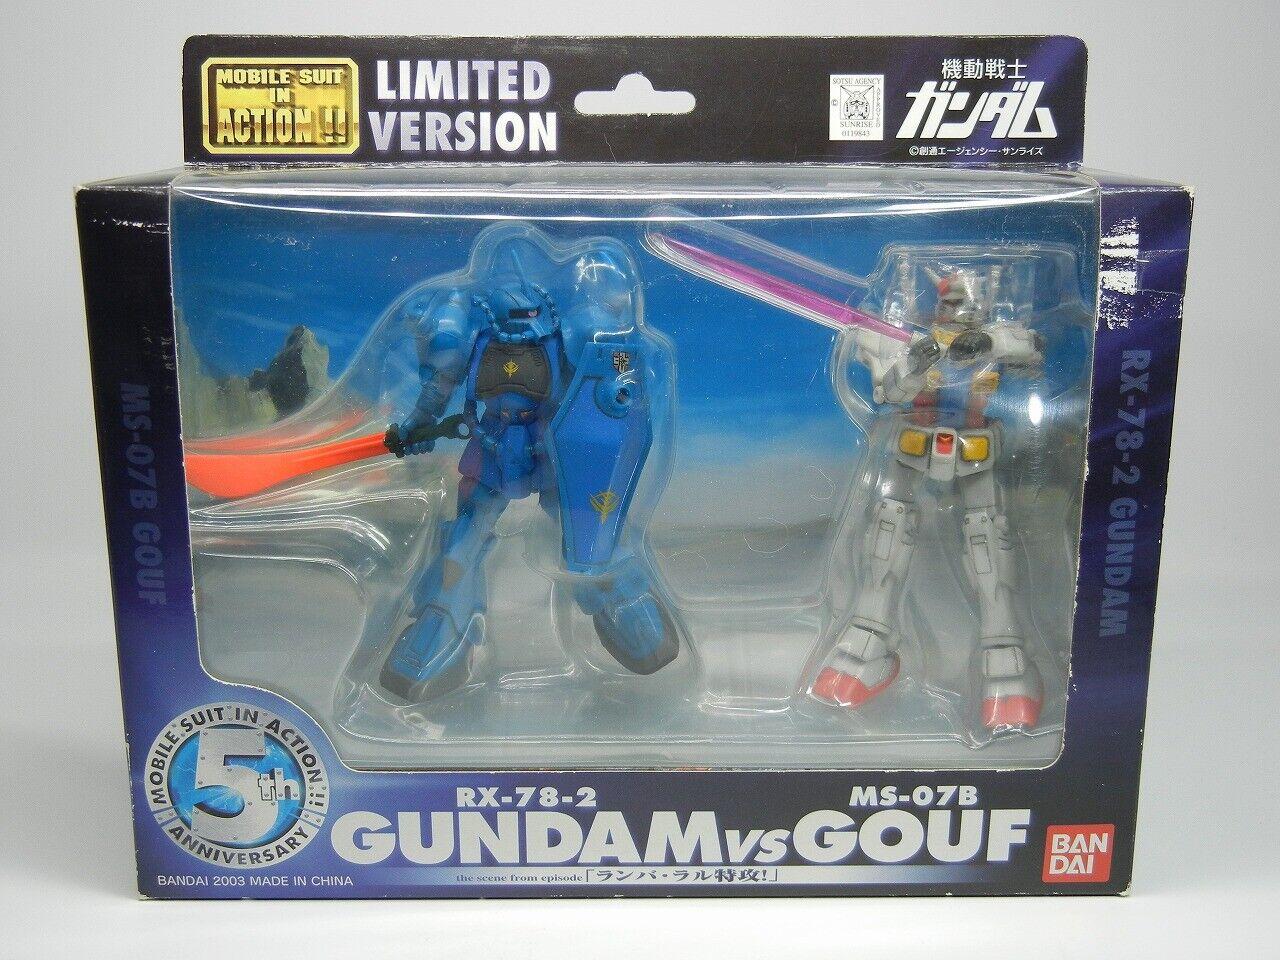 MSIA 5th Anniversary  Limited   RX-78-2 Gundam vs MS-07B Gouf   cifra Beai  benvenuto a scegliere